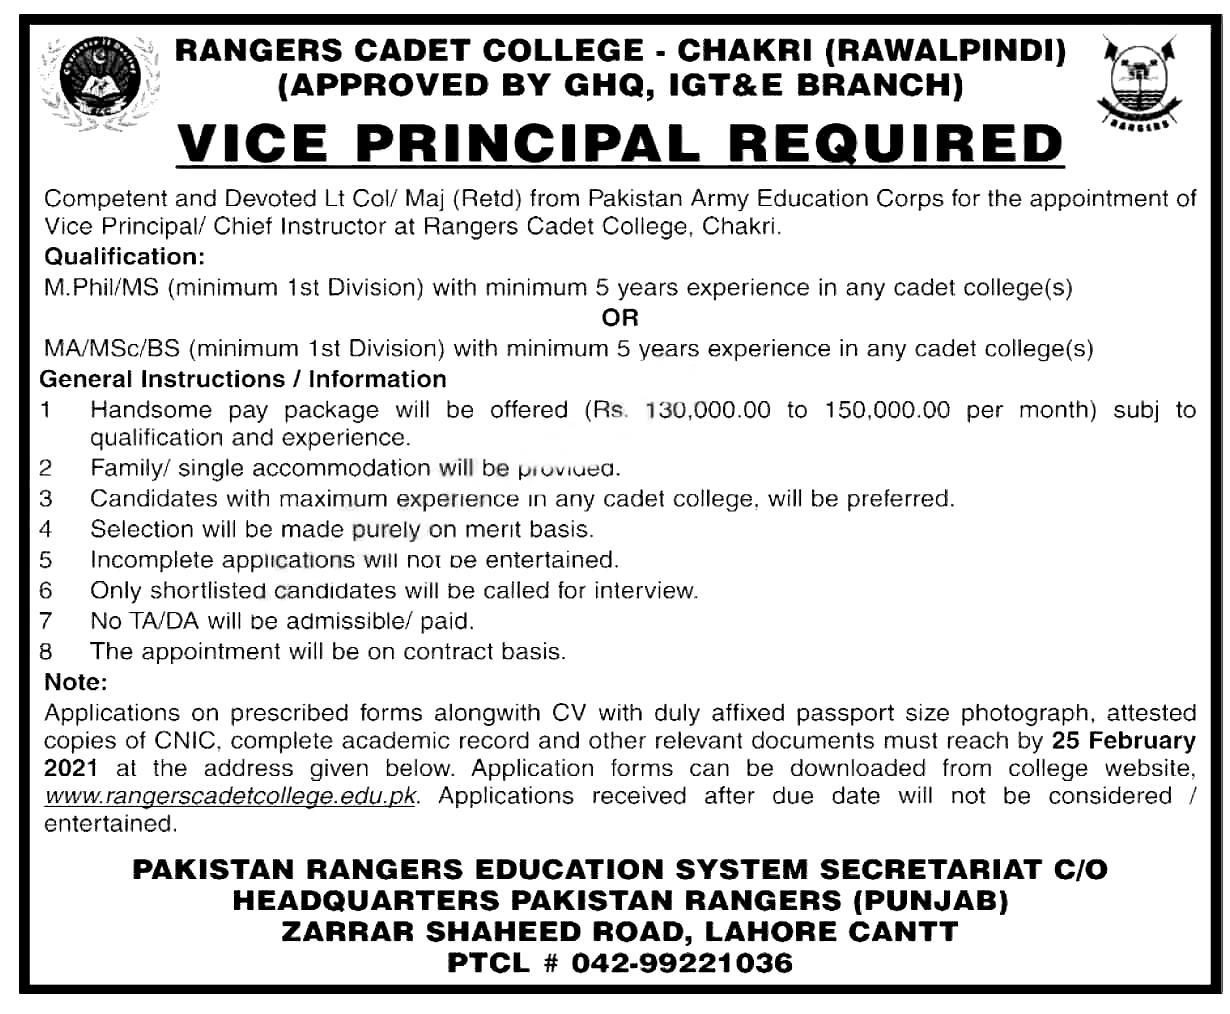 Rangers Cadet College Chakri Jobs 2021